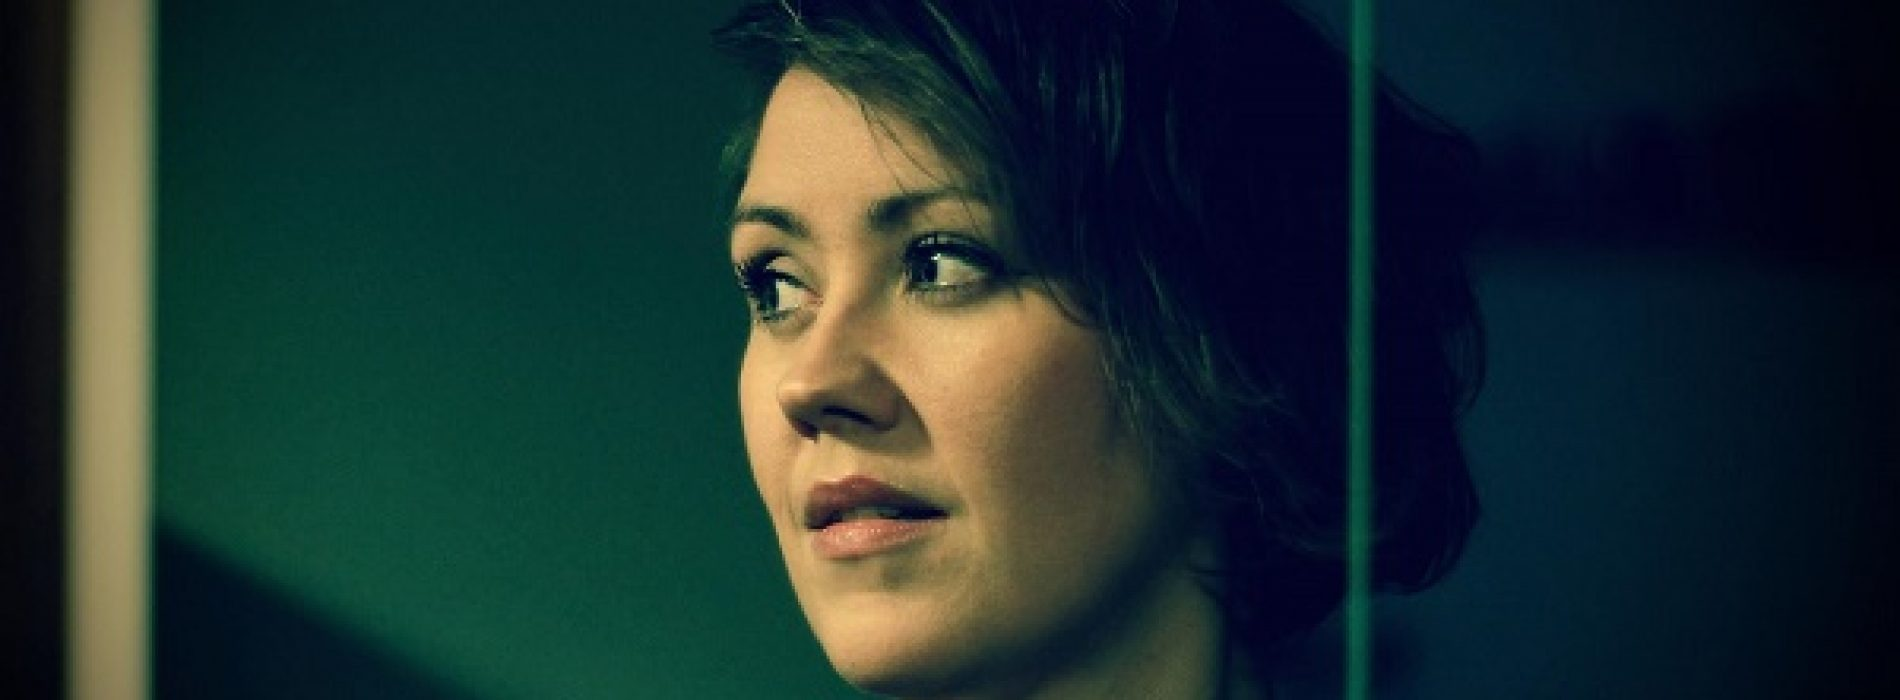 TunedIn London presents Ösp's Tales From A Poplar Tree Album Launch